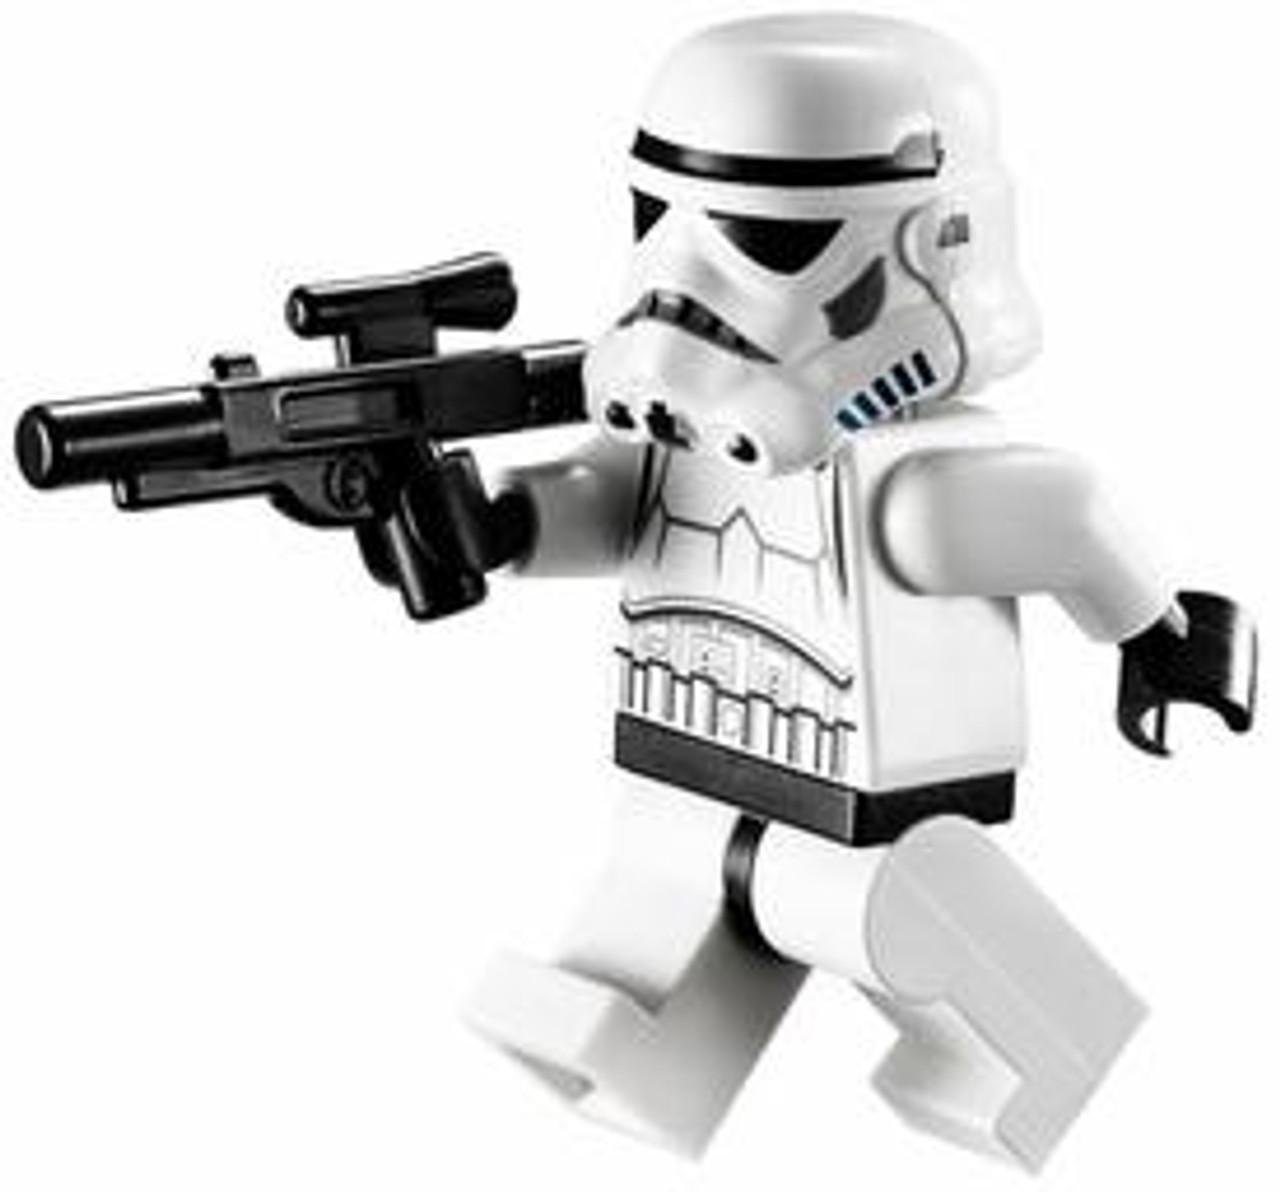 LEGO Star Wars Loose Stormtrooper Minifigure [Version 2 Loose]